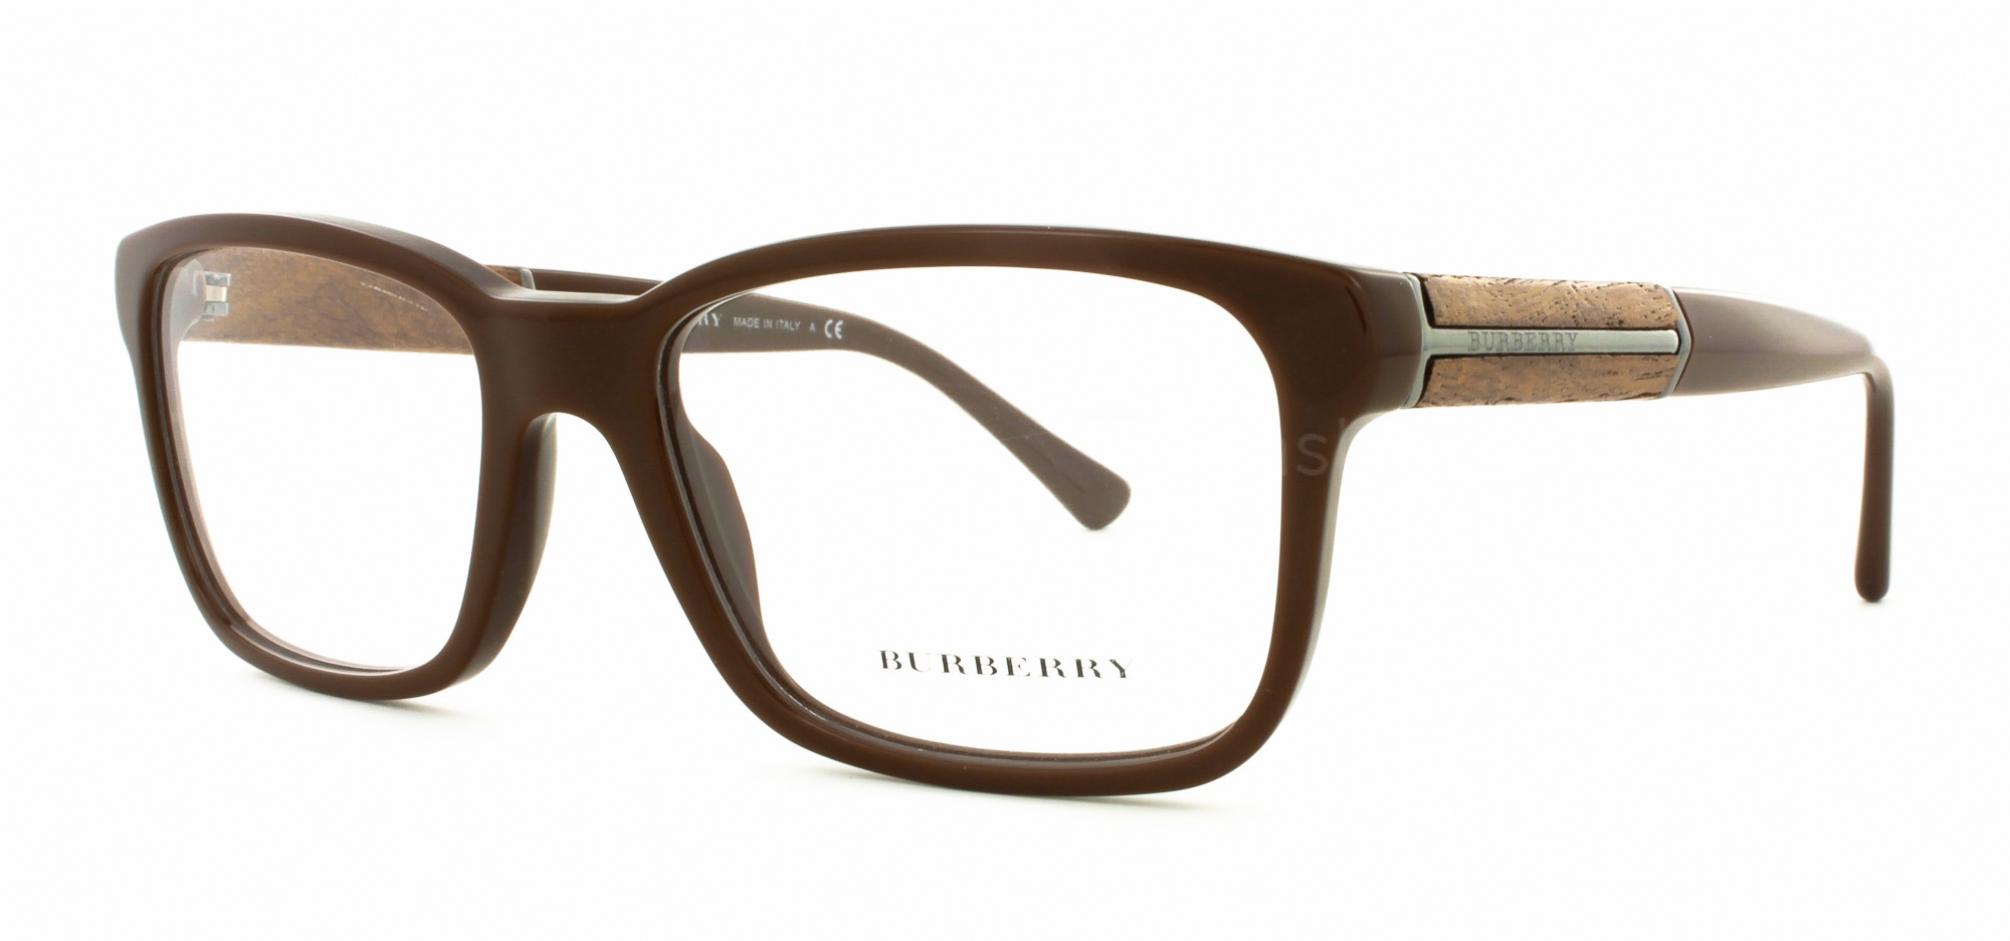 burberry 2149 eyeglasses